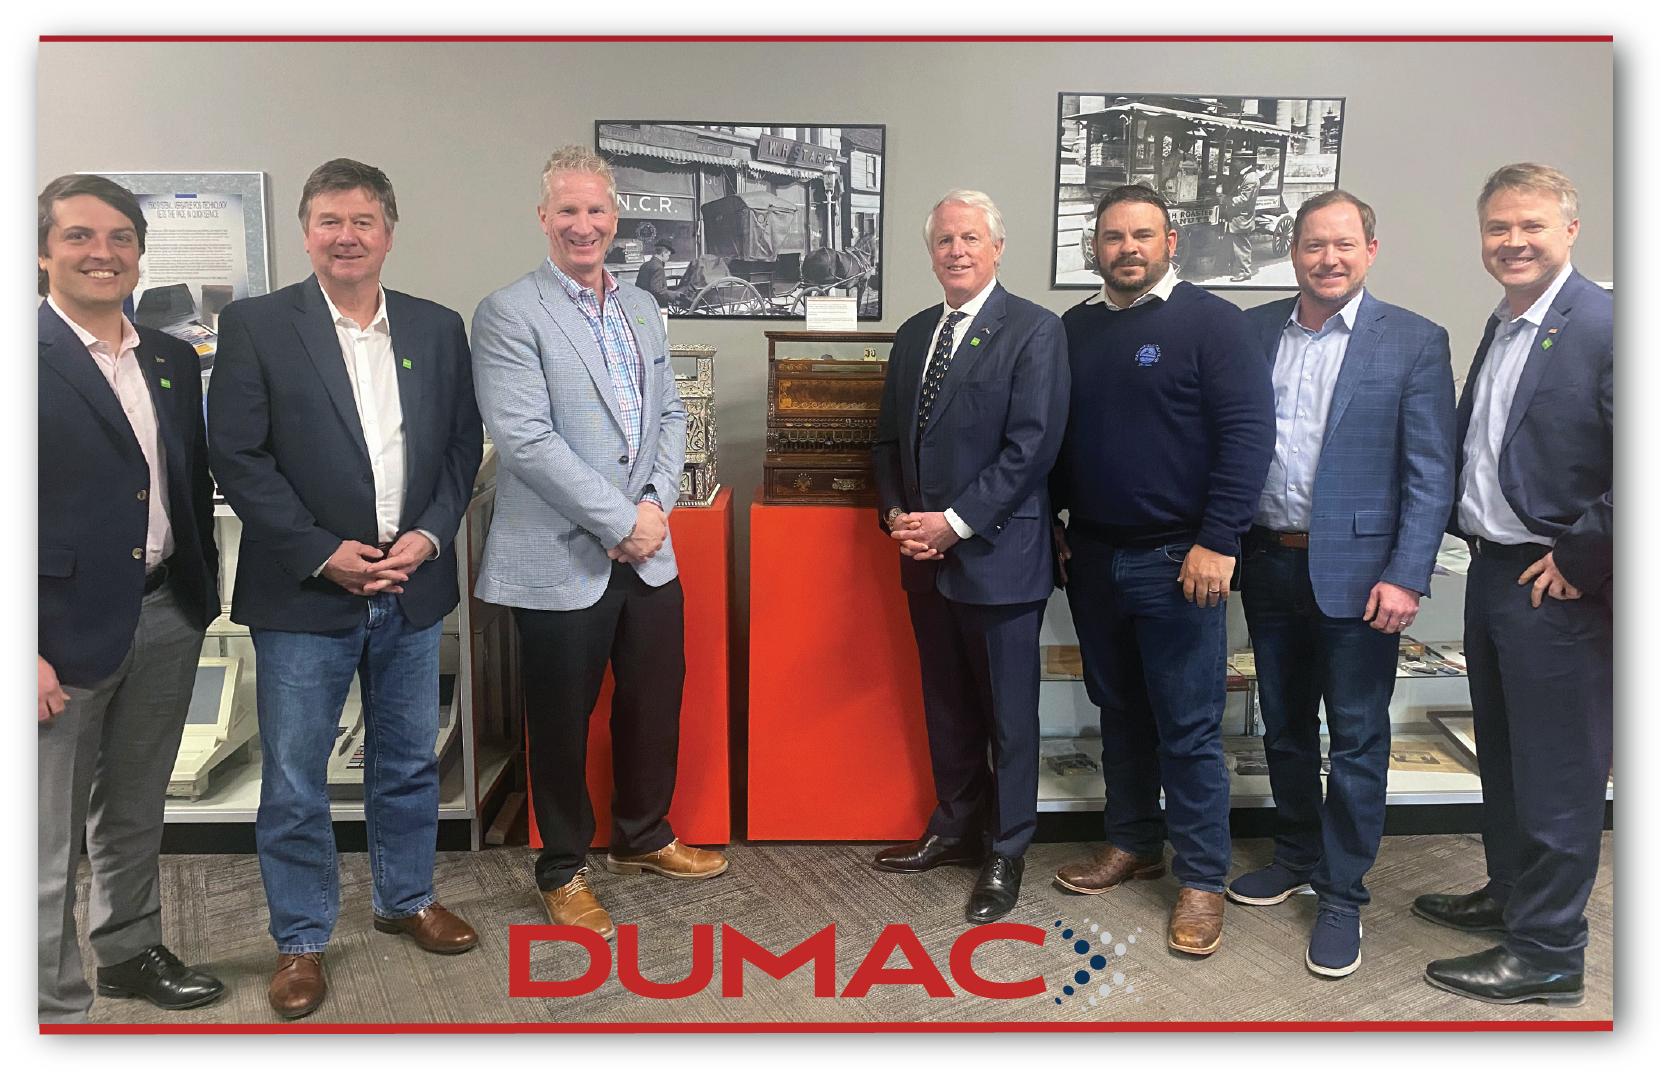 DUMAC Achieves Top CFR Sales!